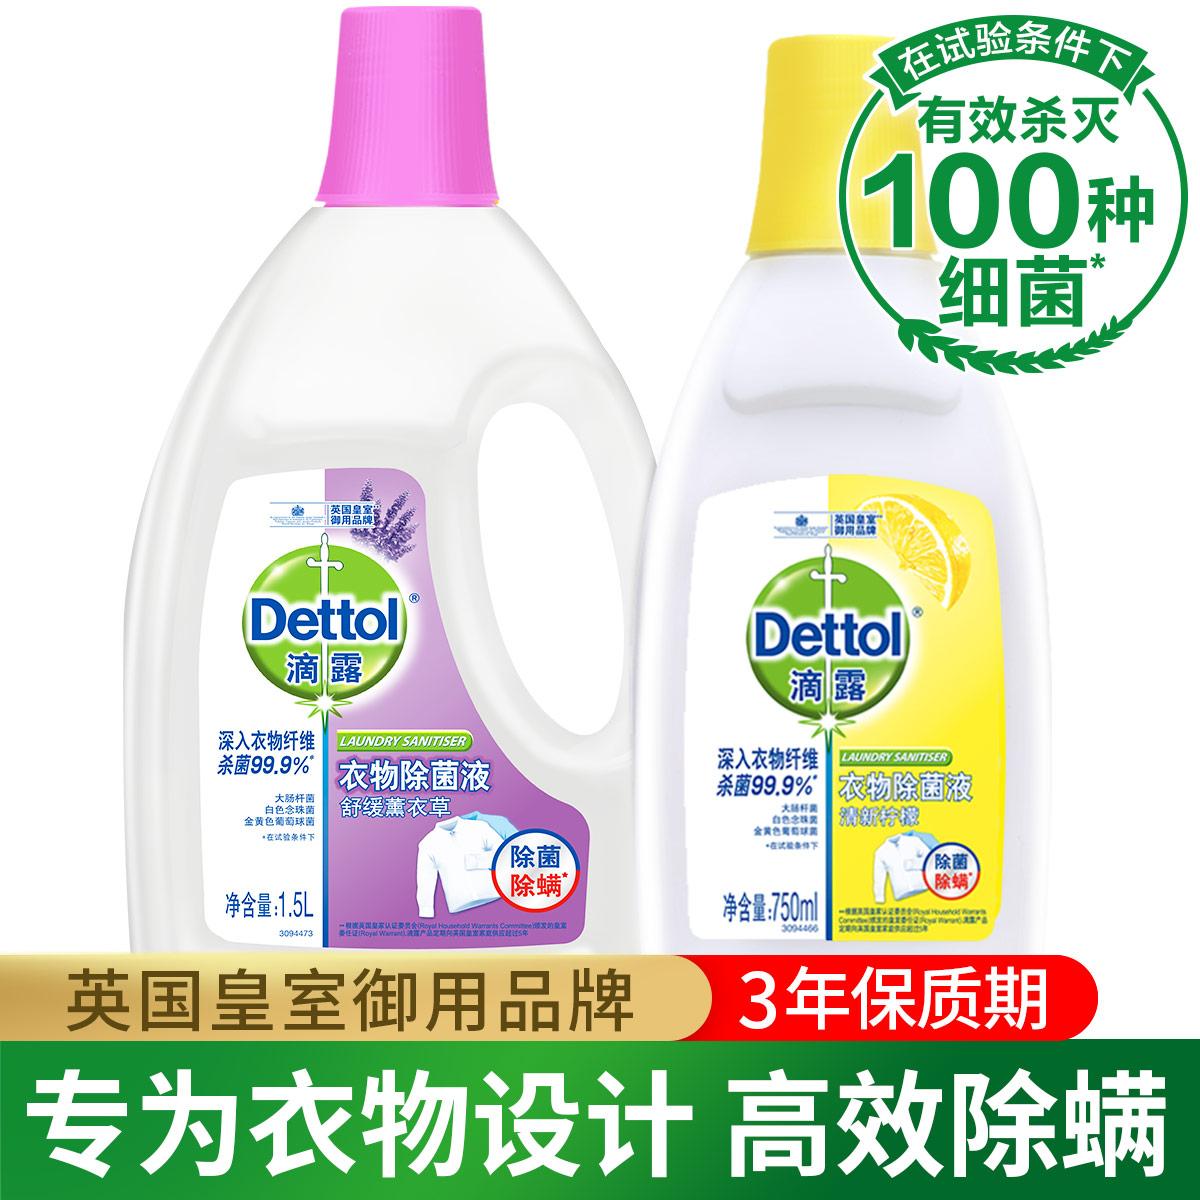 Dettol 【杀灭细菌100种】除螨为衣物消毒设计 滴露衣物除菌液1.5L+750ml